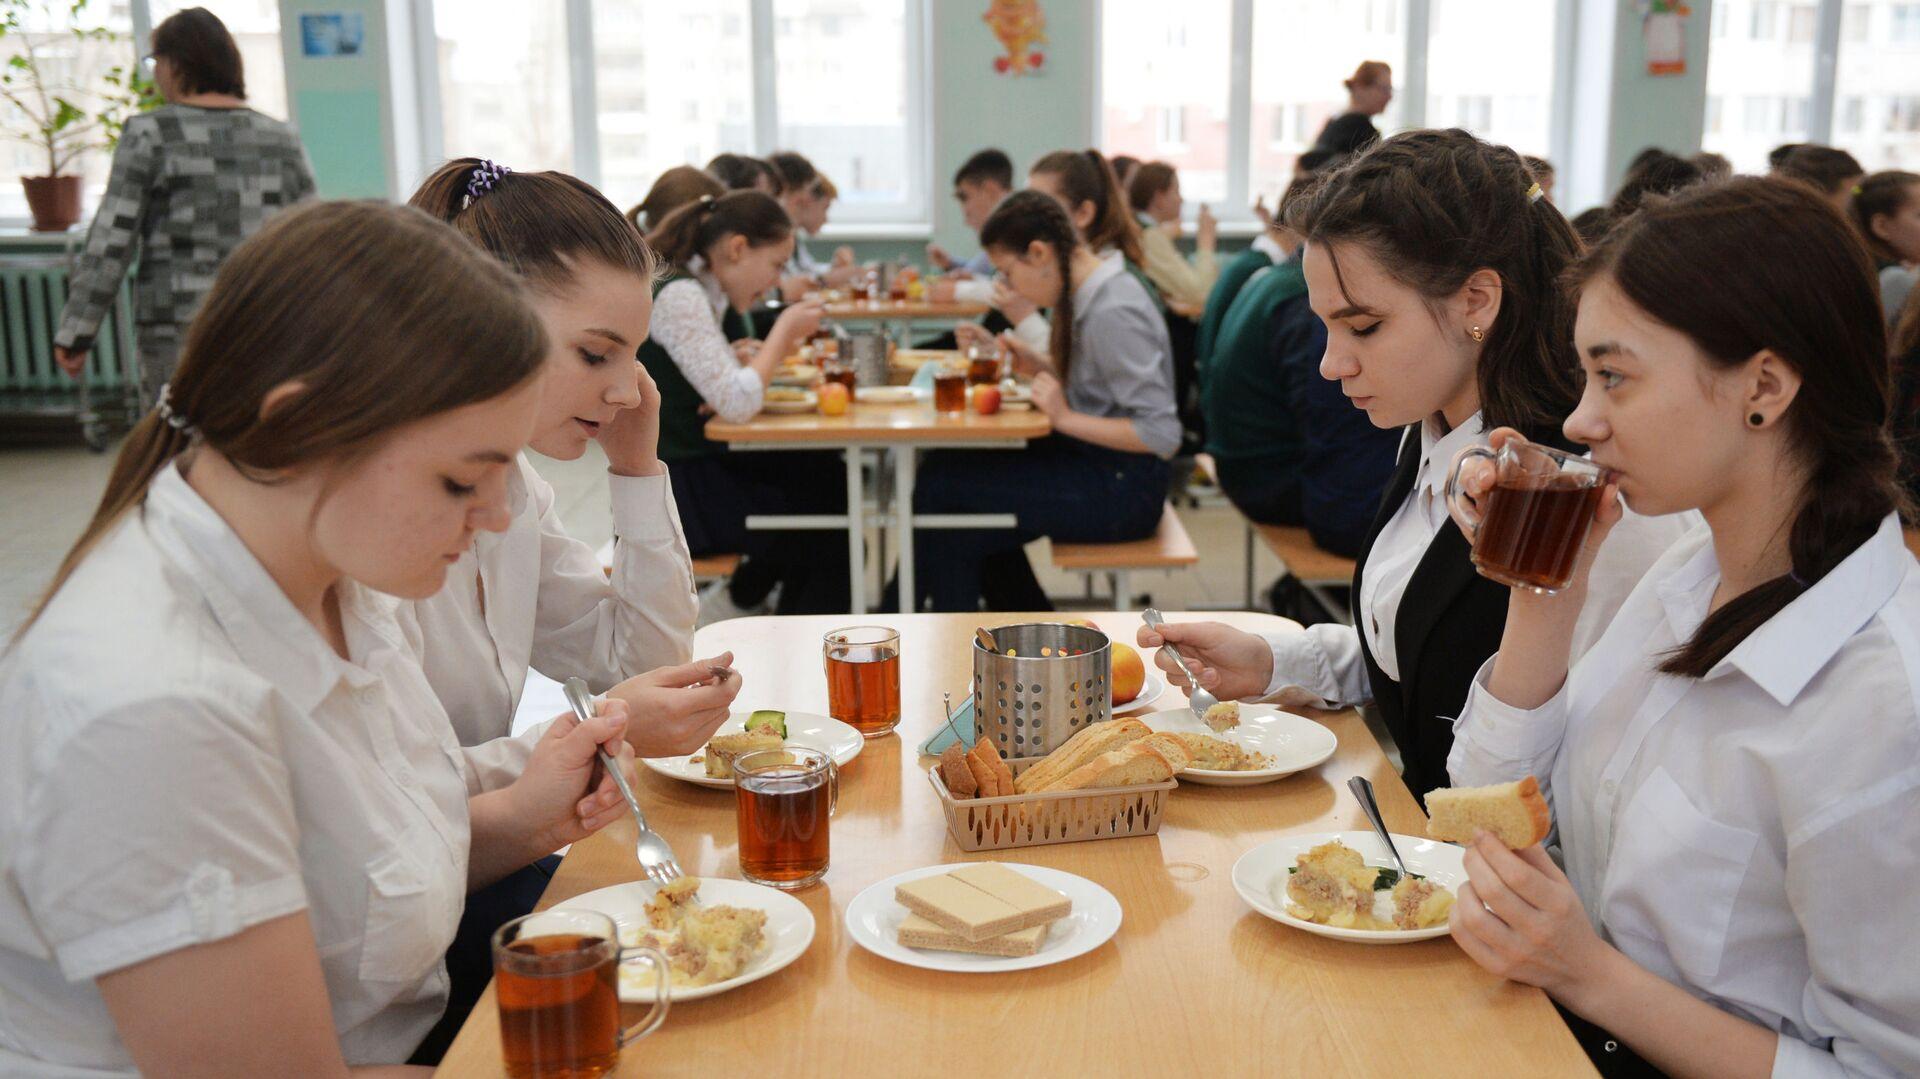 Организация питания в школах - Sputnik Узбекистан, 1920, 06.10.2021